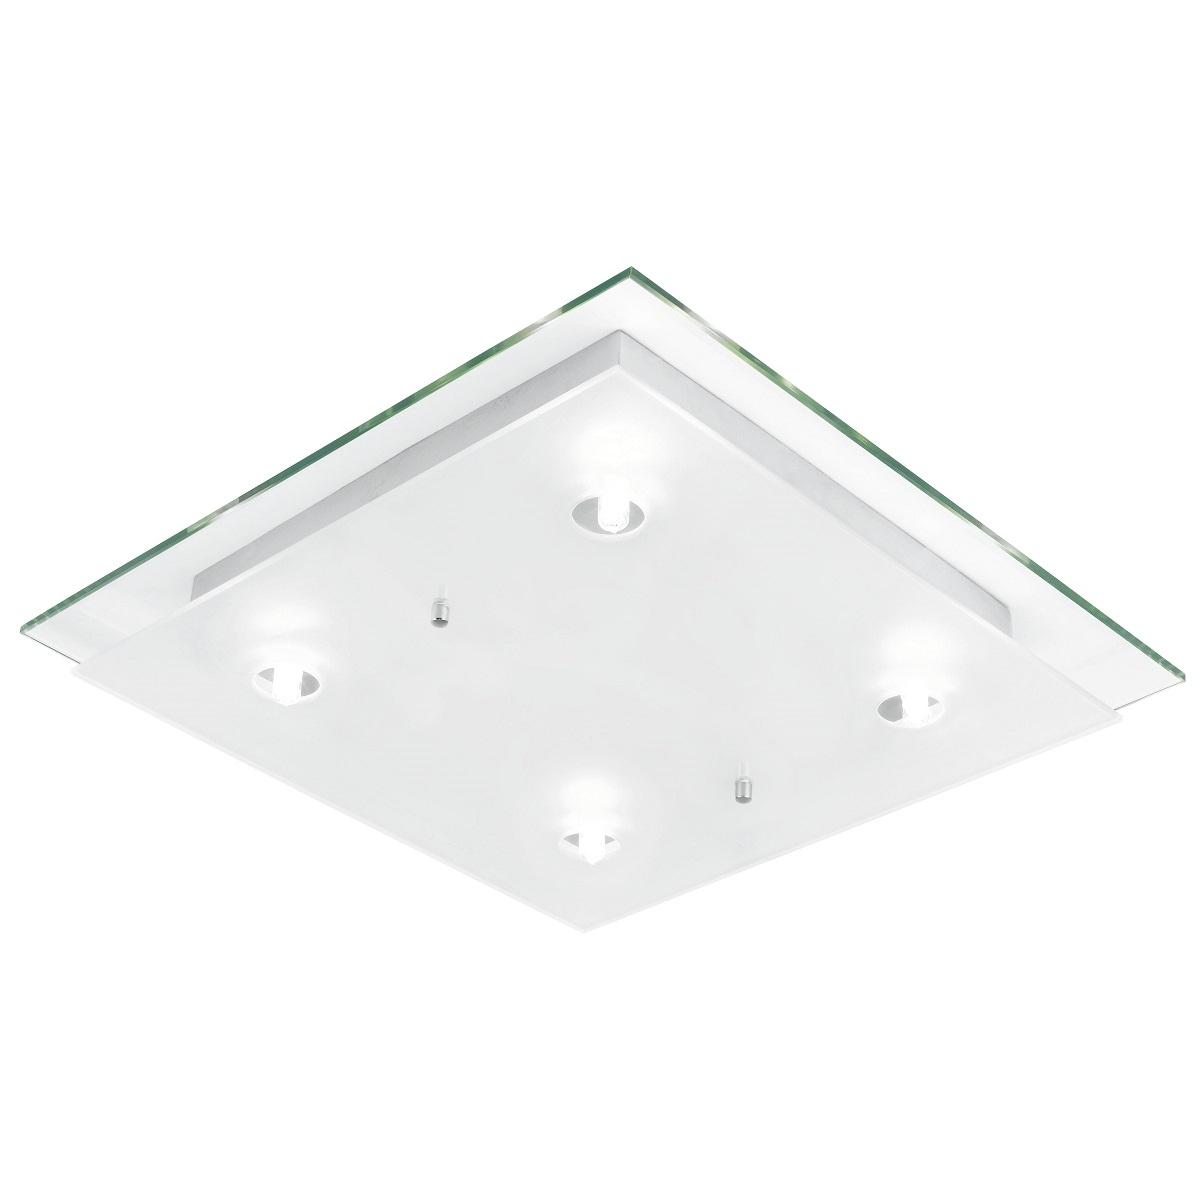 eglo-deckenleuchte-fres-quadro-transparent-grau-metall-stahl-85344